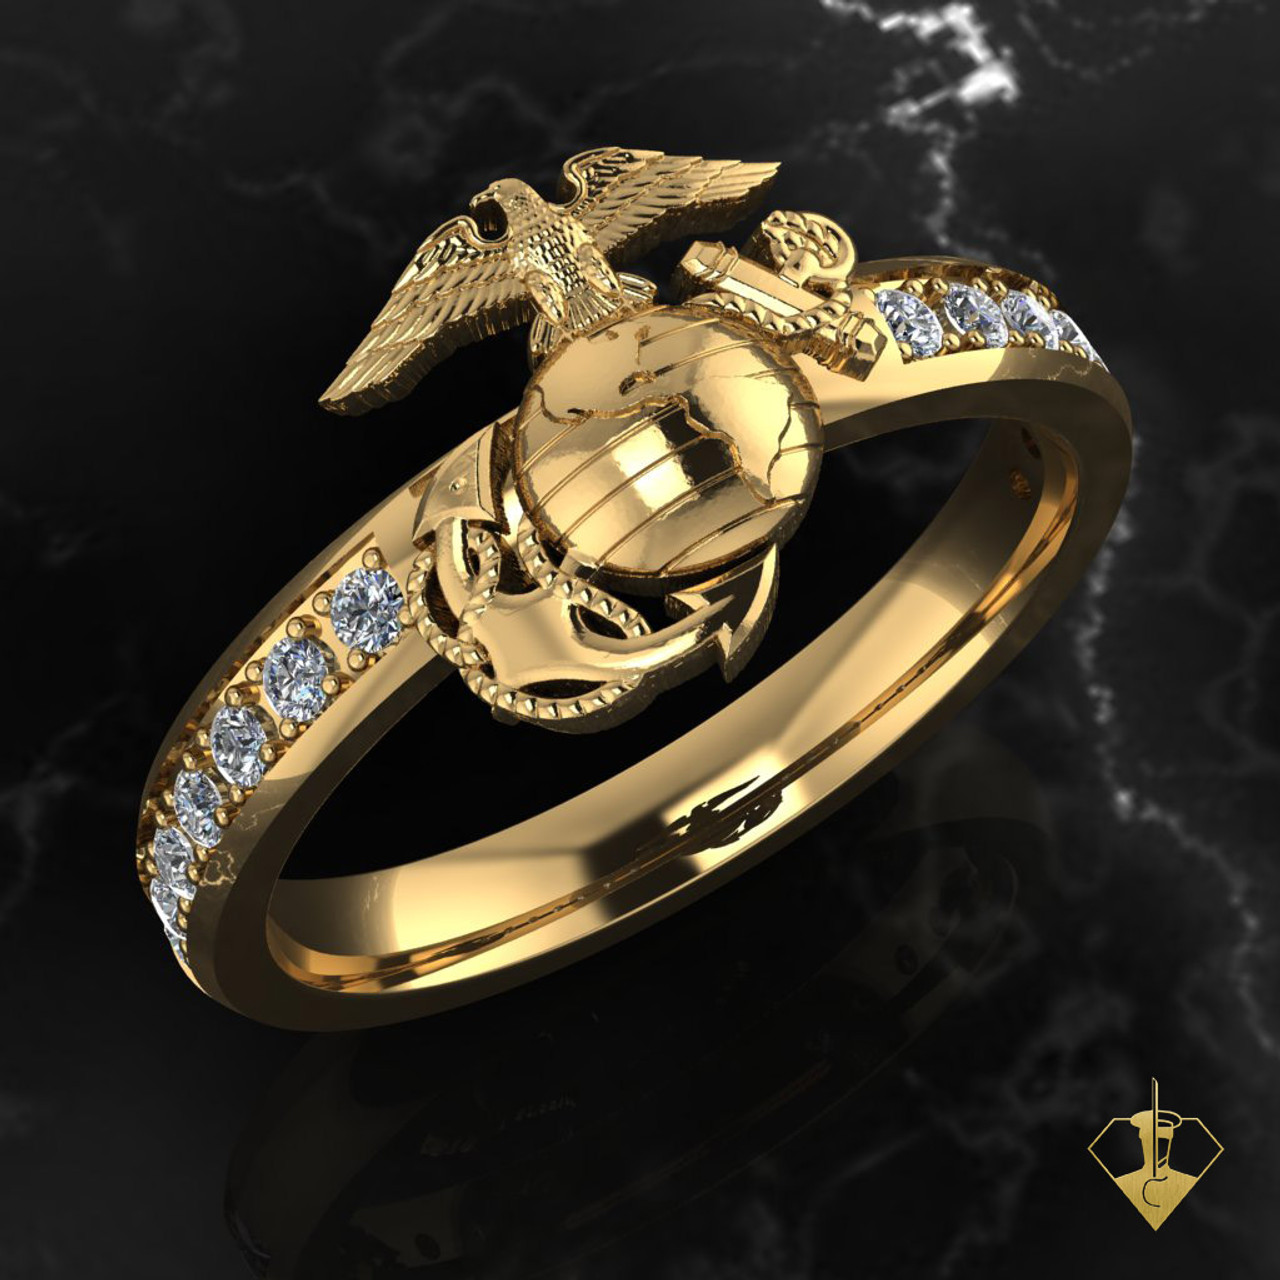 Woman Marine Corps EGA Yellow Gold with Diamond Band